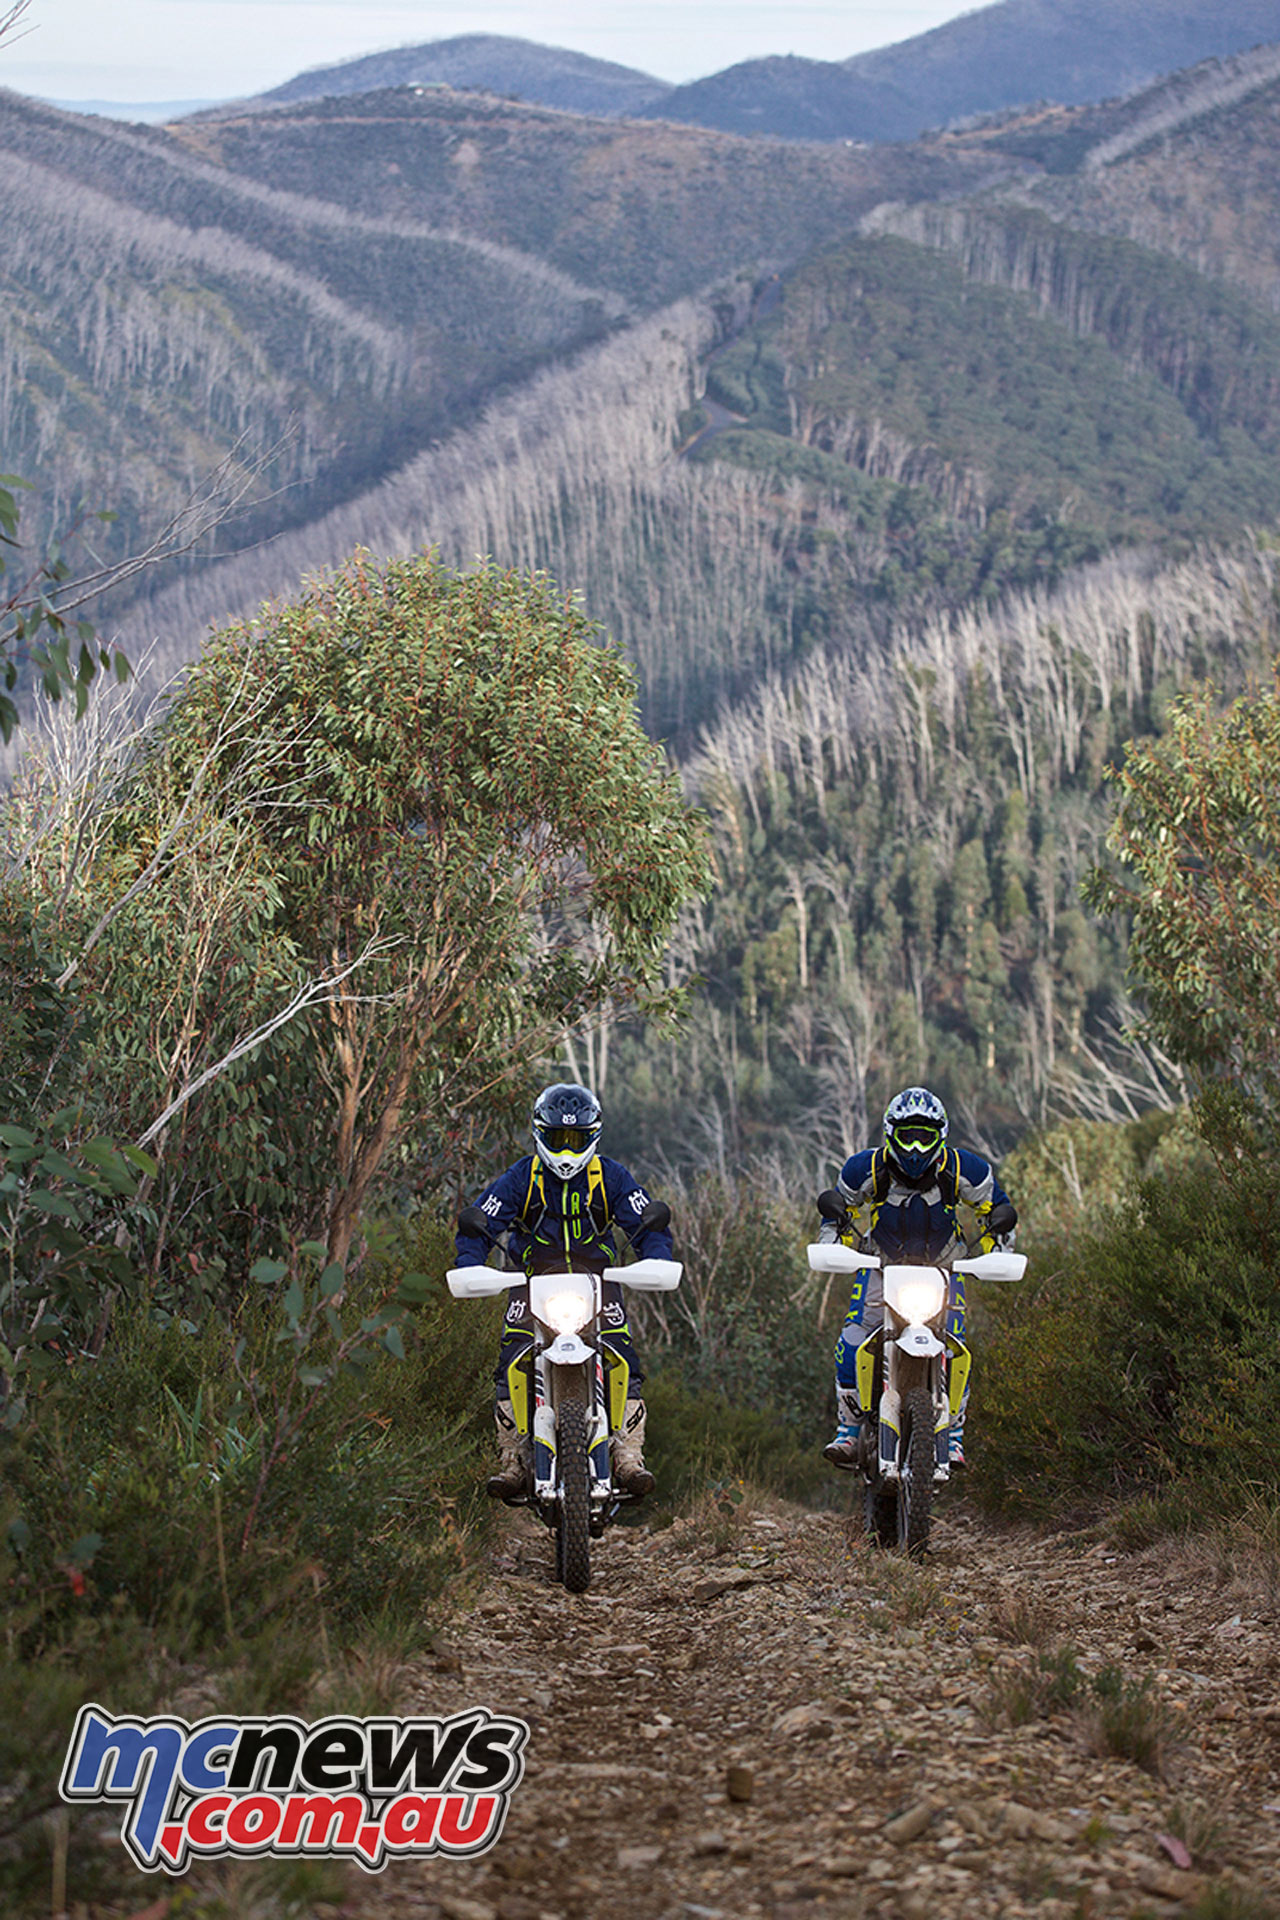 Husqvarna High Country Adventure Enduro Trek